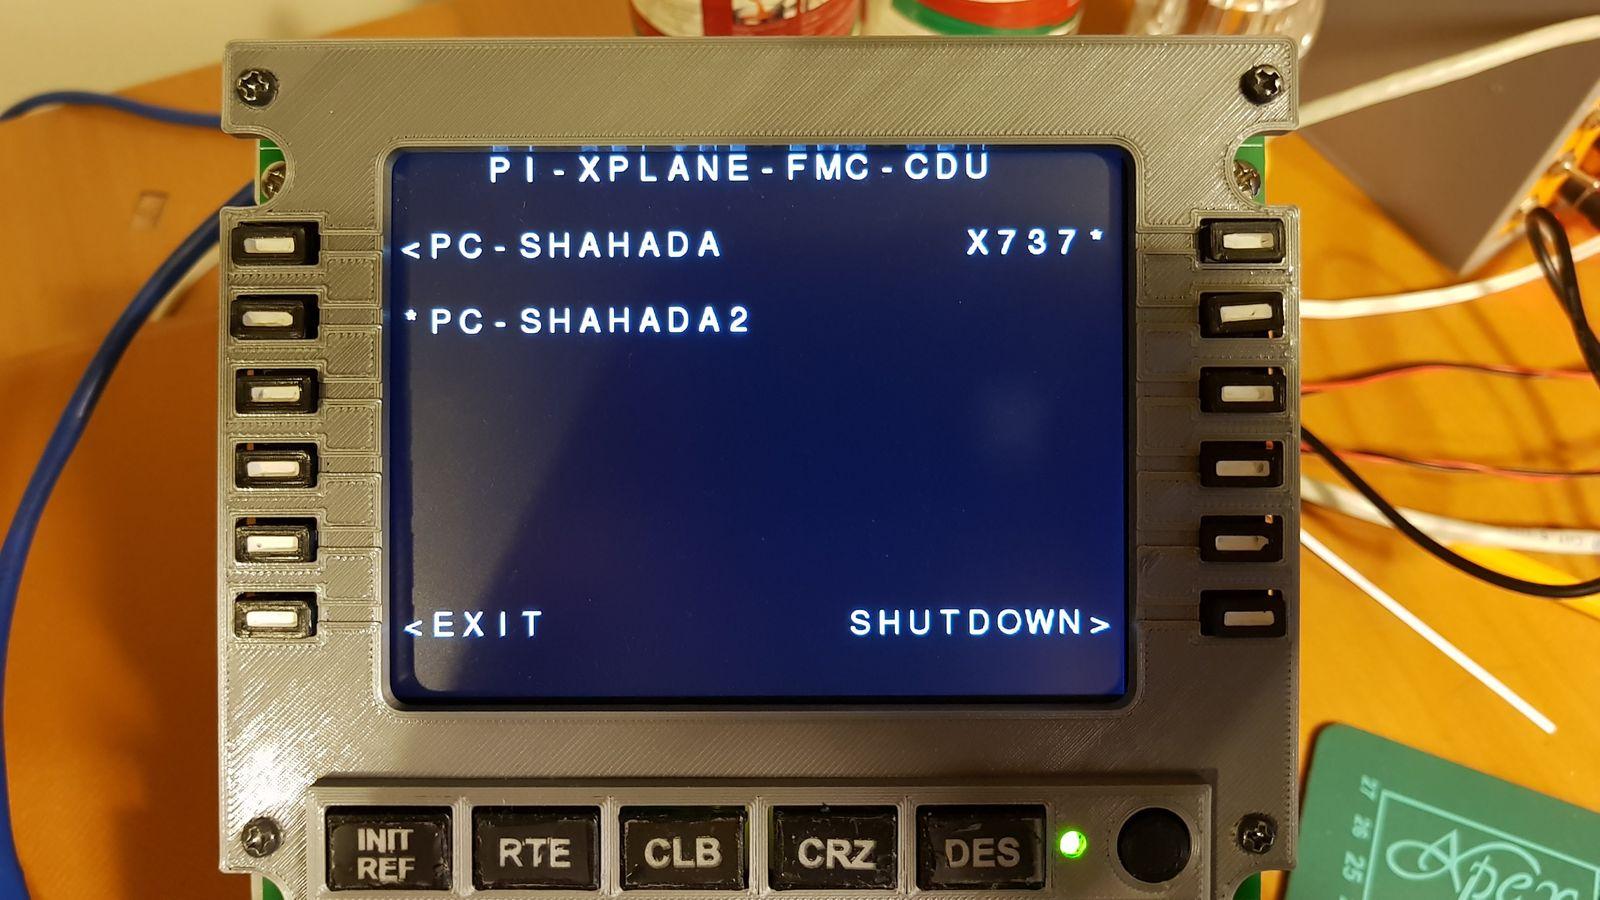 Installing PiXPlaneFMCCDU Software | Life, The Universe and